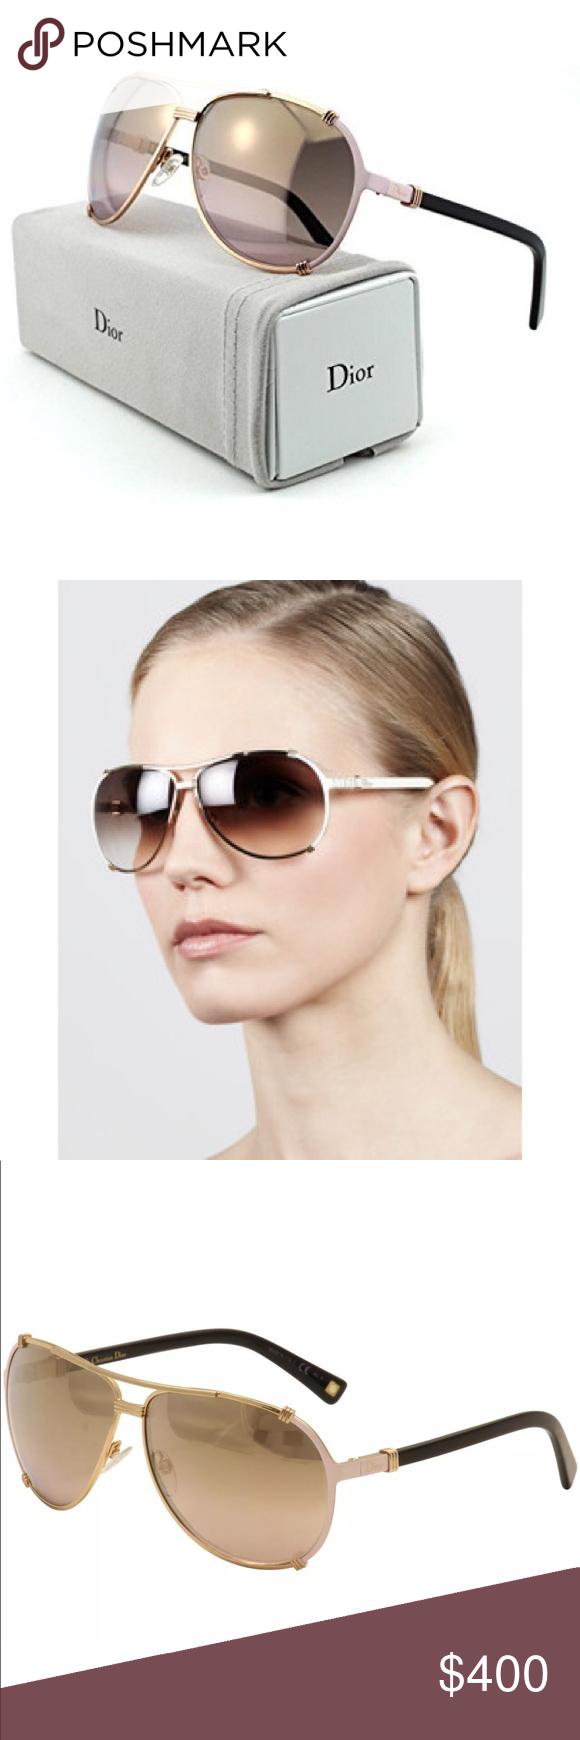 212e99752e75 Christian Dior Sunglasses Christian Dior Women's Chicago-2/S HFBOR Gold/Pink /Black Pilot Sunglasses 63mm Product Indormation Brand: Christian Dior  Model: ...